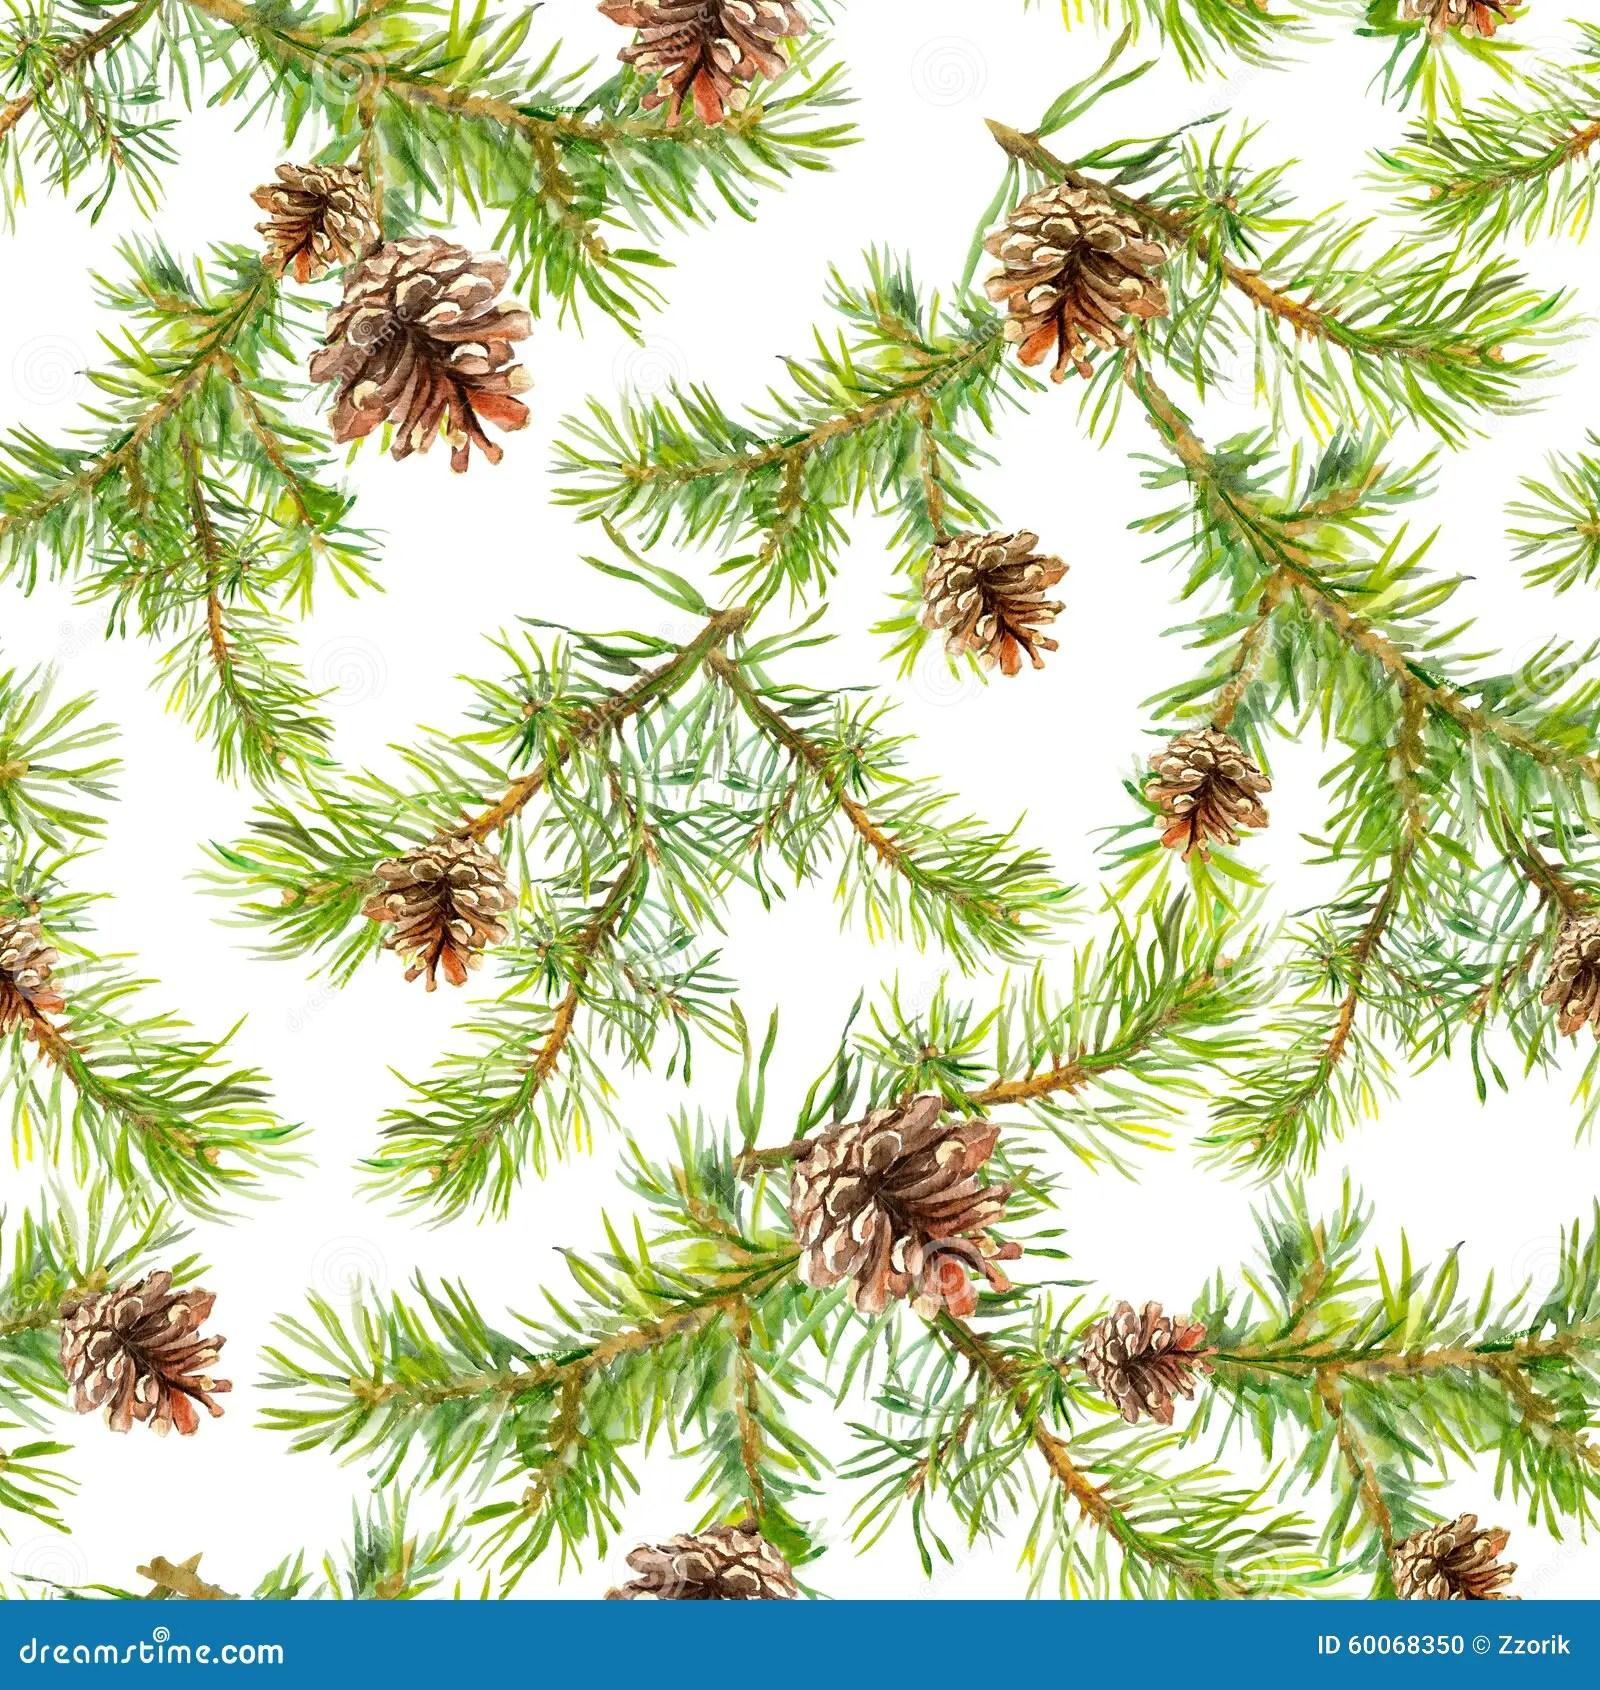 Fabric Christmas Tree Cone Pattern